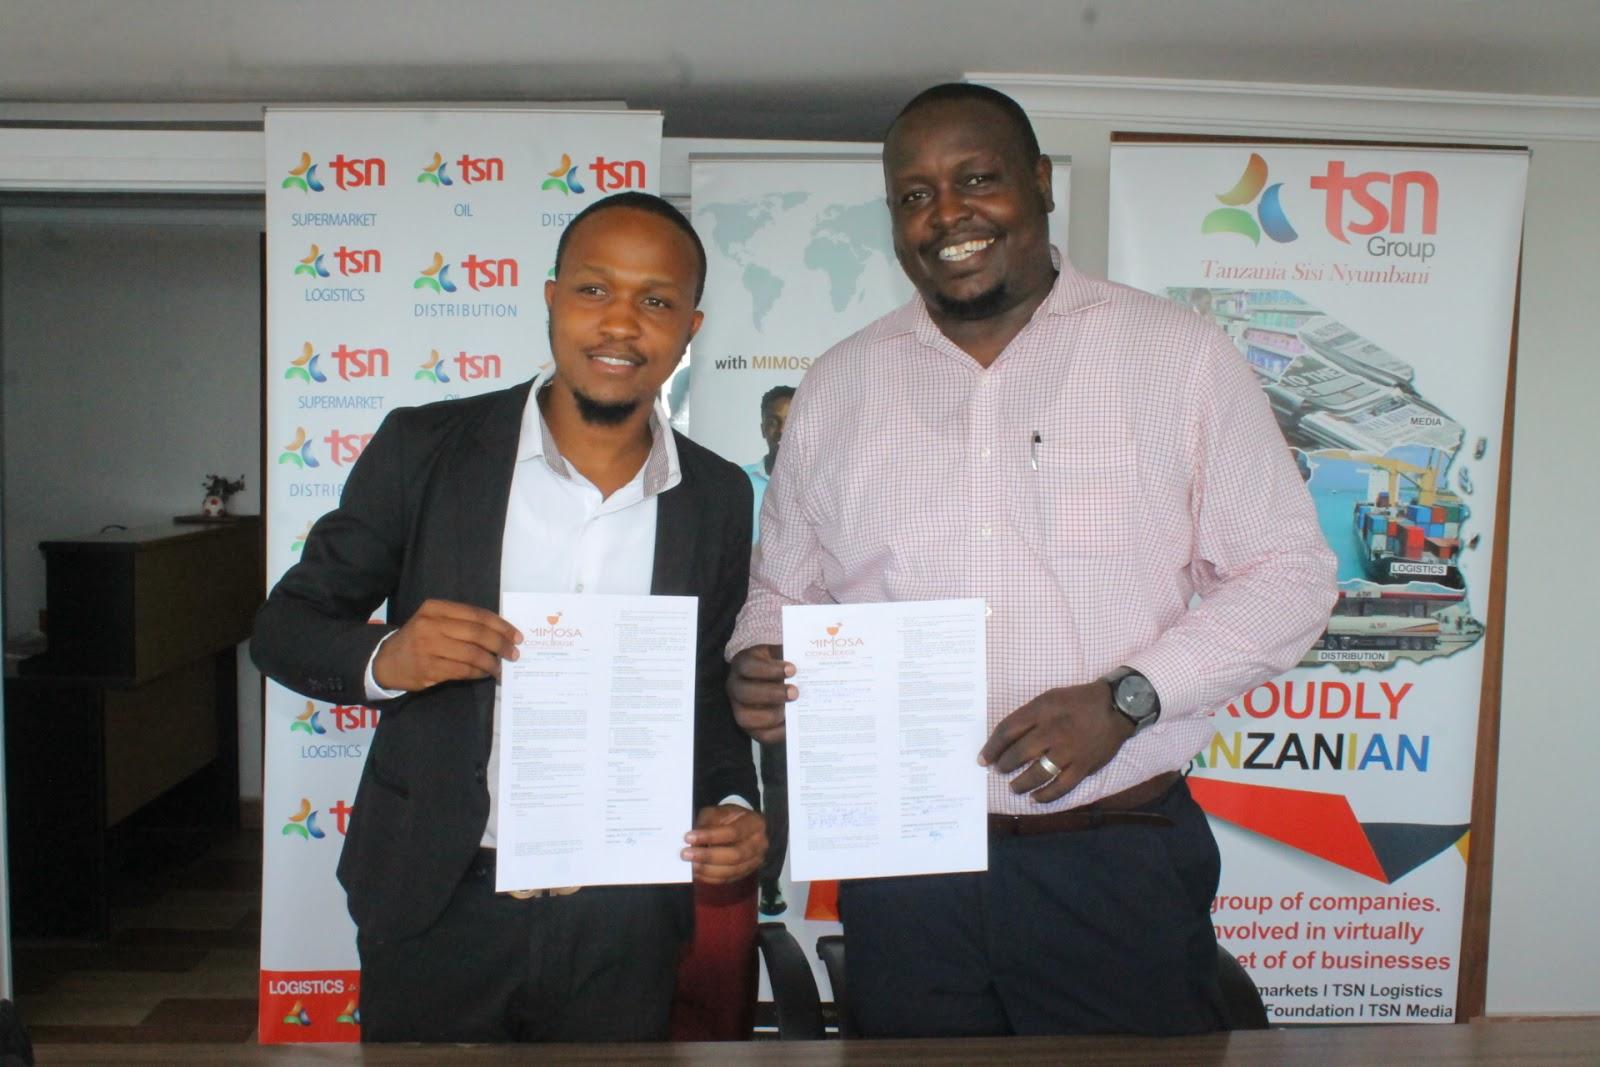 Tsn Group Tanzania Na Mimosa Concierge Wasaini Mkataba Leo Dar Es Salam Tanga Raha Blog